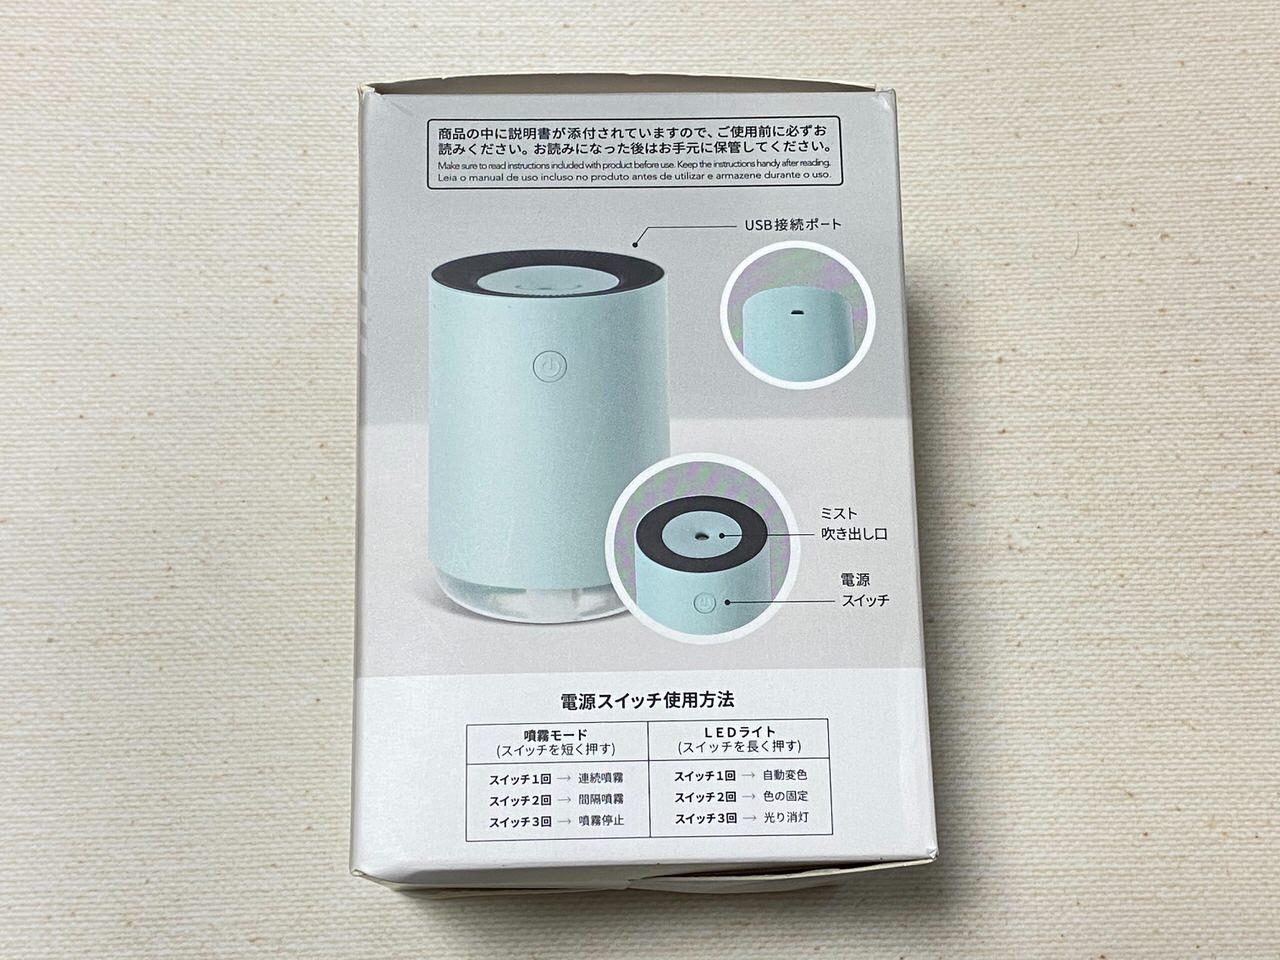 USBで給電するダイソーの500円加湿器を試してみた(円柱型) 2